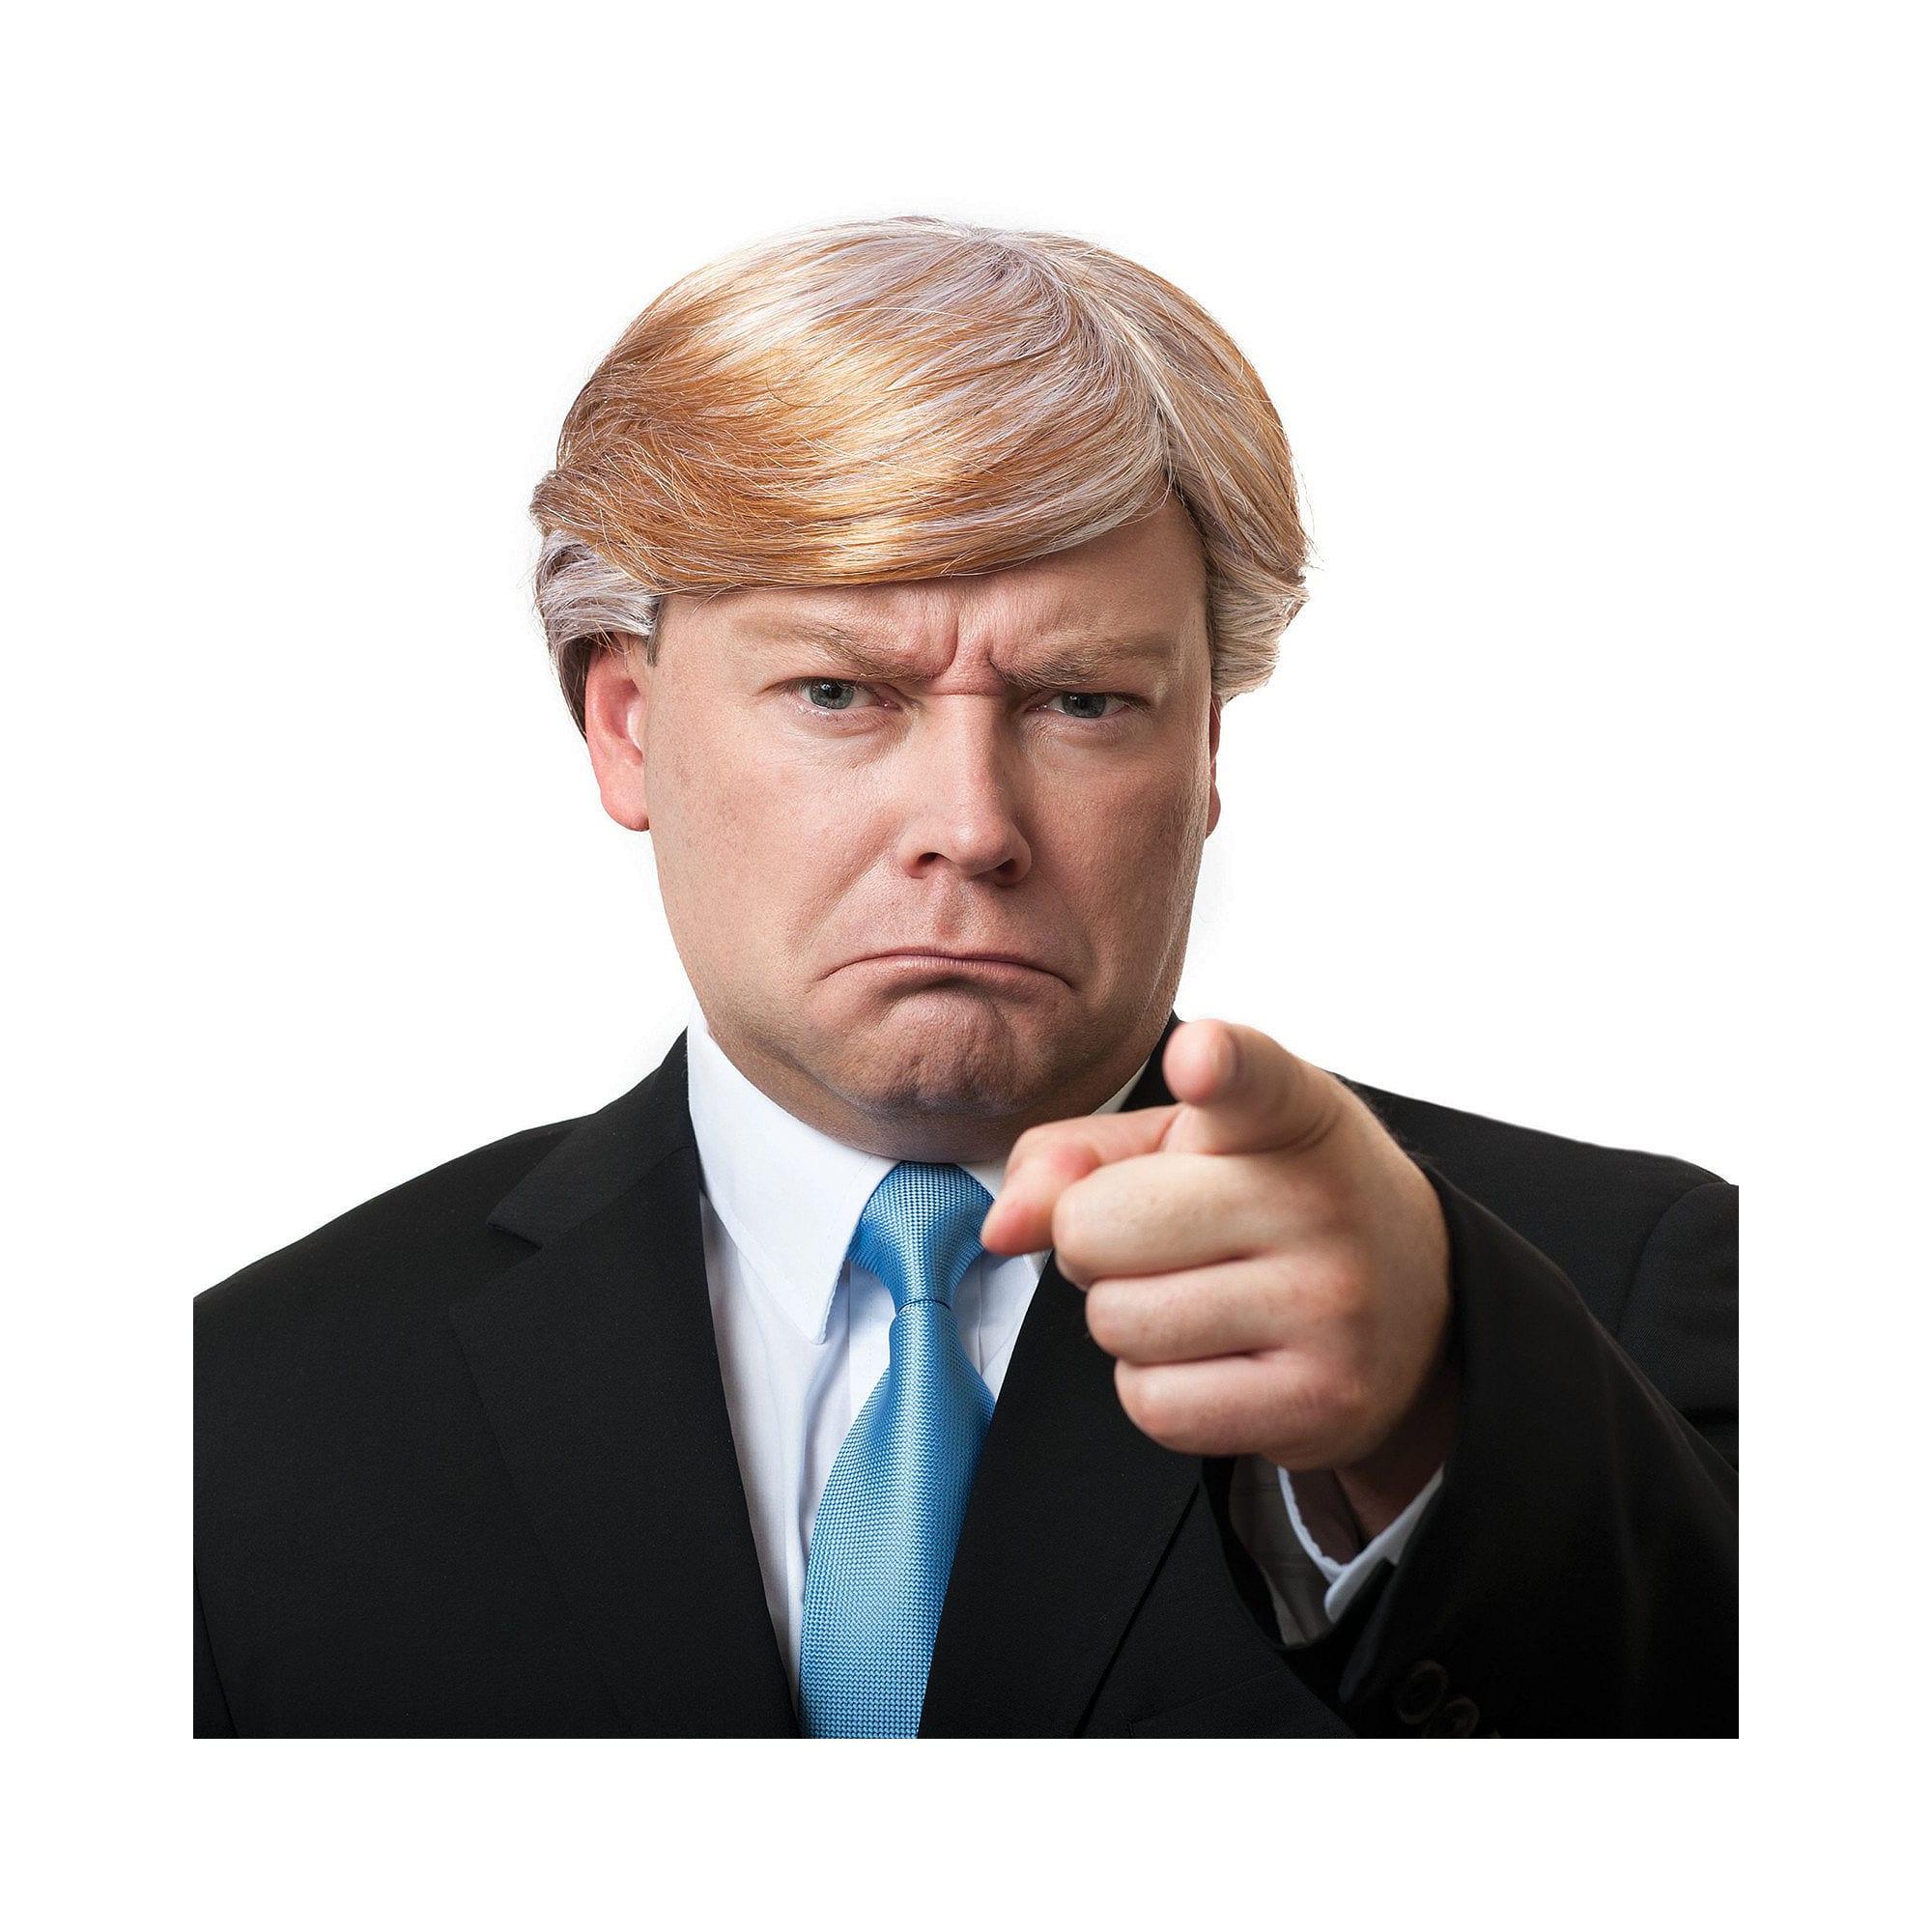 Mr. CEO Honey Blonde Wig 6